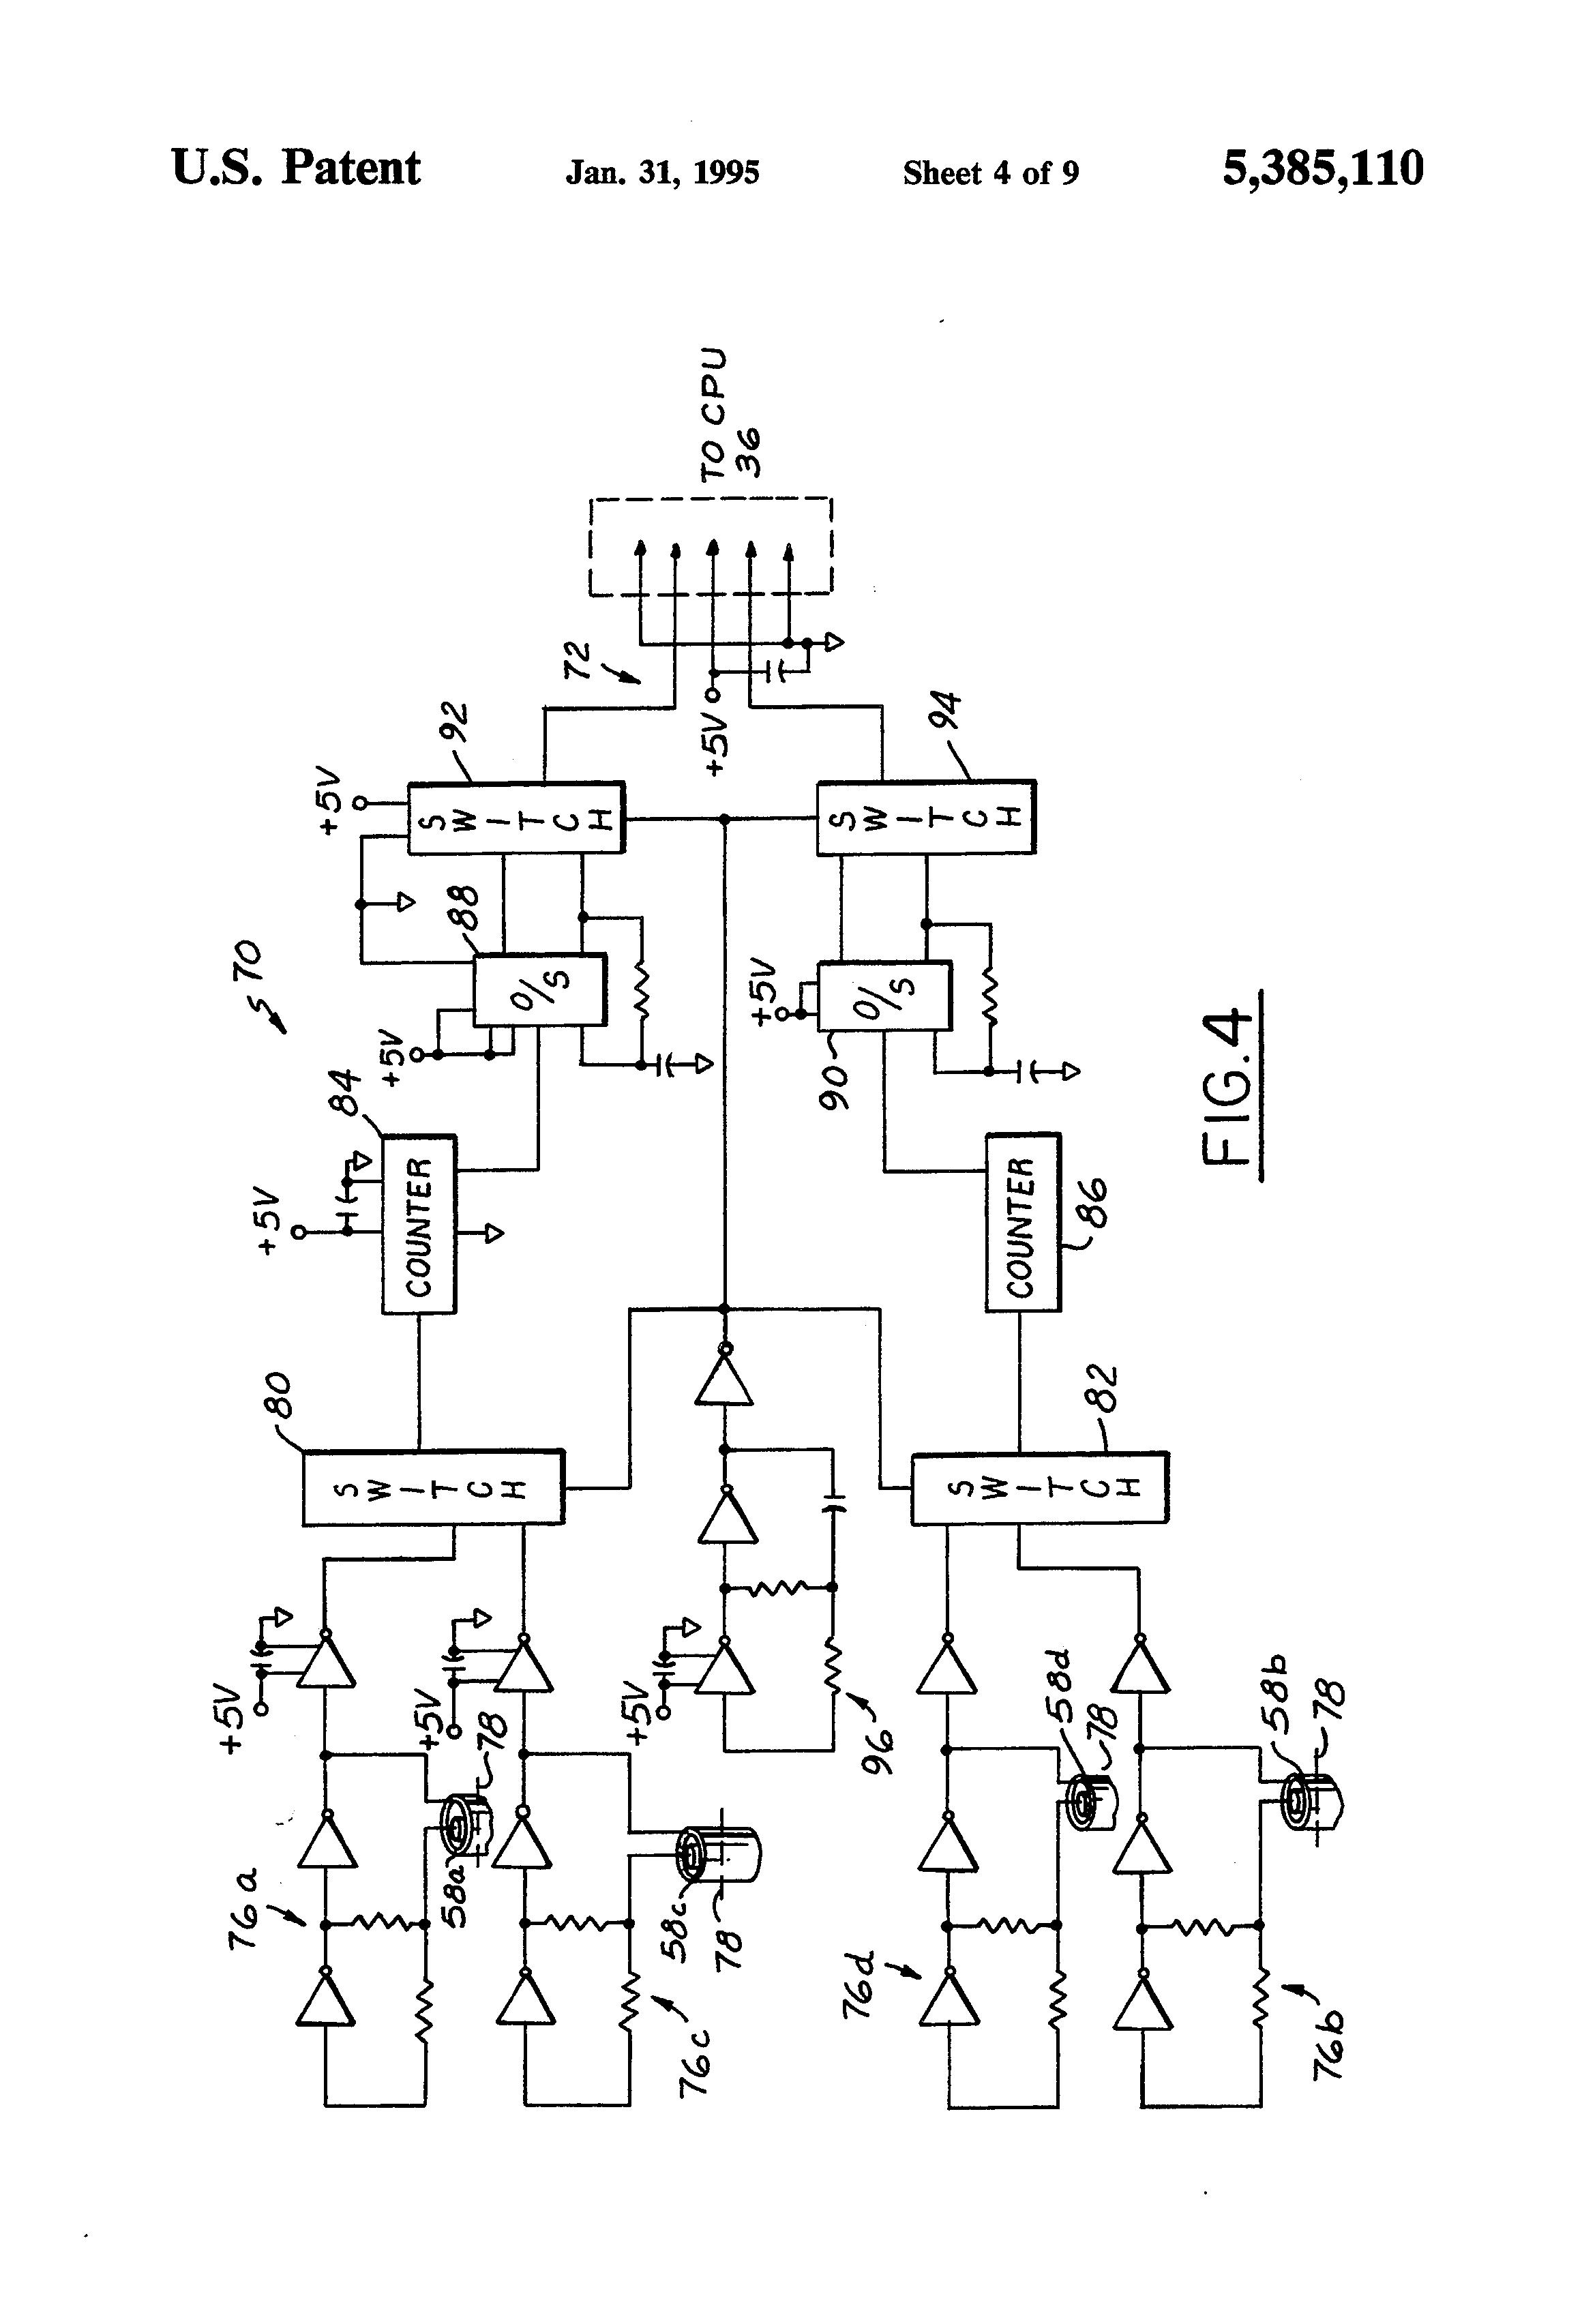 Bennett Trim Tab Pump Wiring Diagram And Schematics Rocker Switch Diagrams Rj45 Female Connector 6mwire